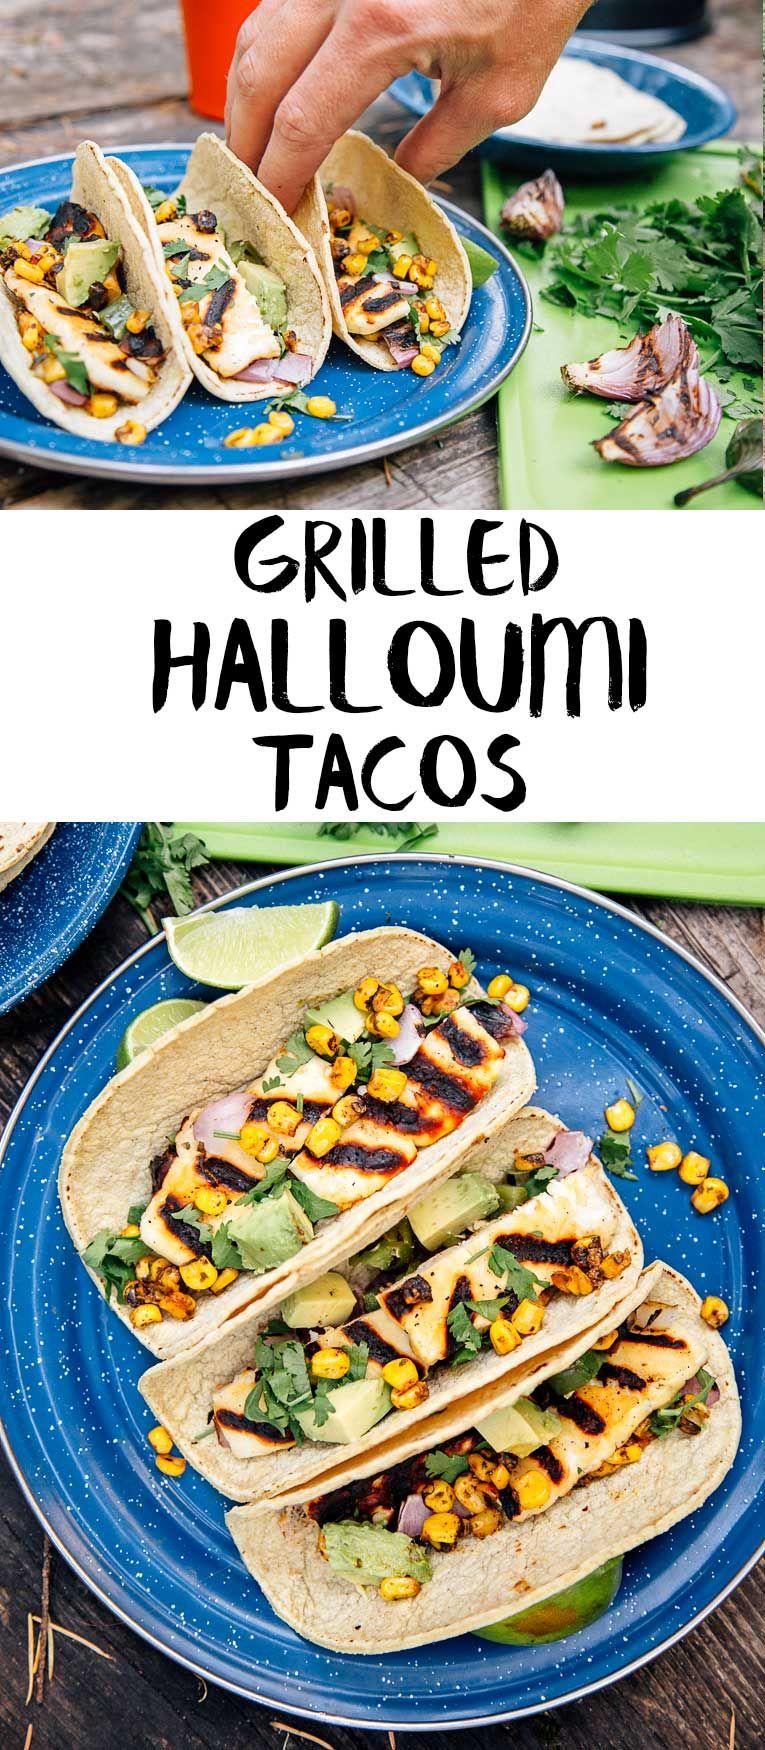 Grilled halloumi tacos recipe vegetarian camping grilled these grilled halloumi tacos are a great vegetarian camping meal easy to prepare and even forumfinder Gallery